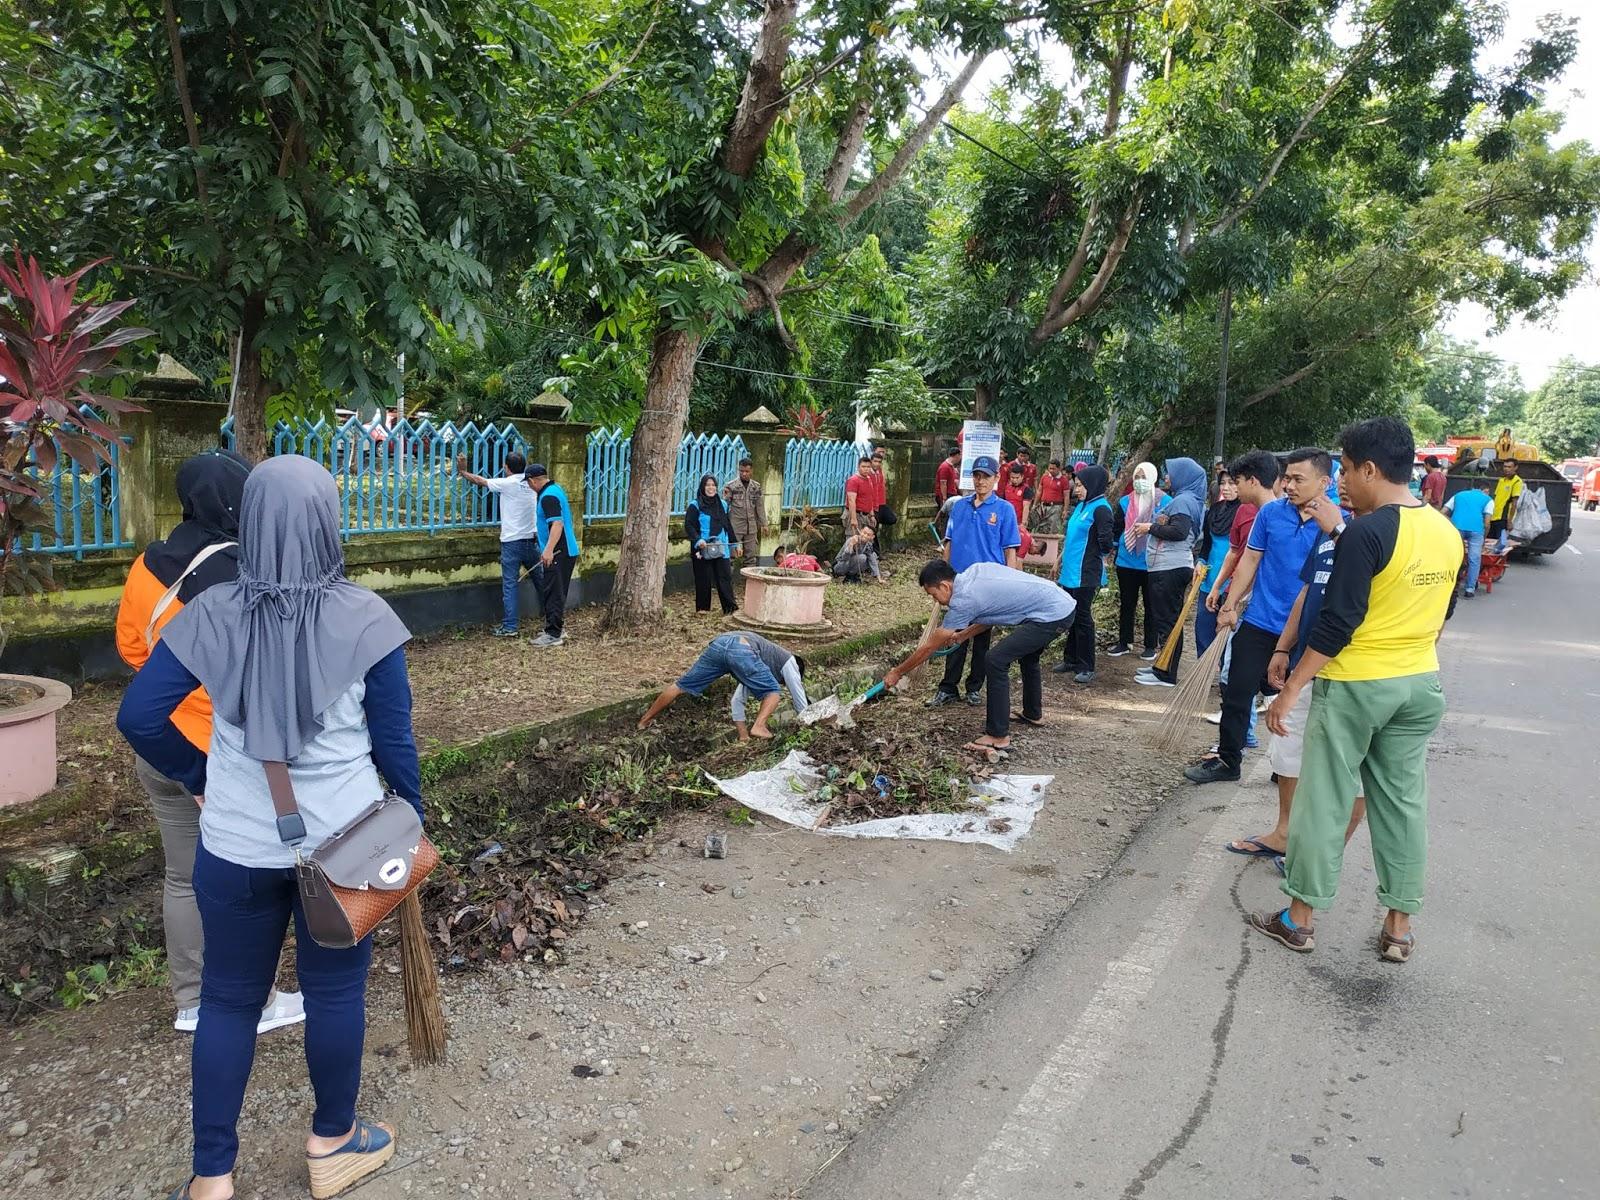 Jadikan Kebersihan Skala Prioritas, Camat Tanete Riattang : Tiada Hari Tanpa Pembersihan